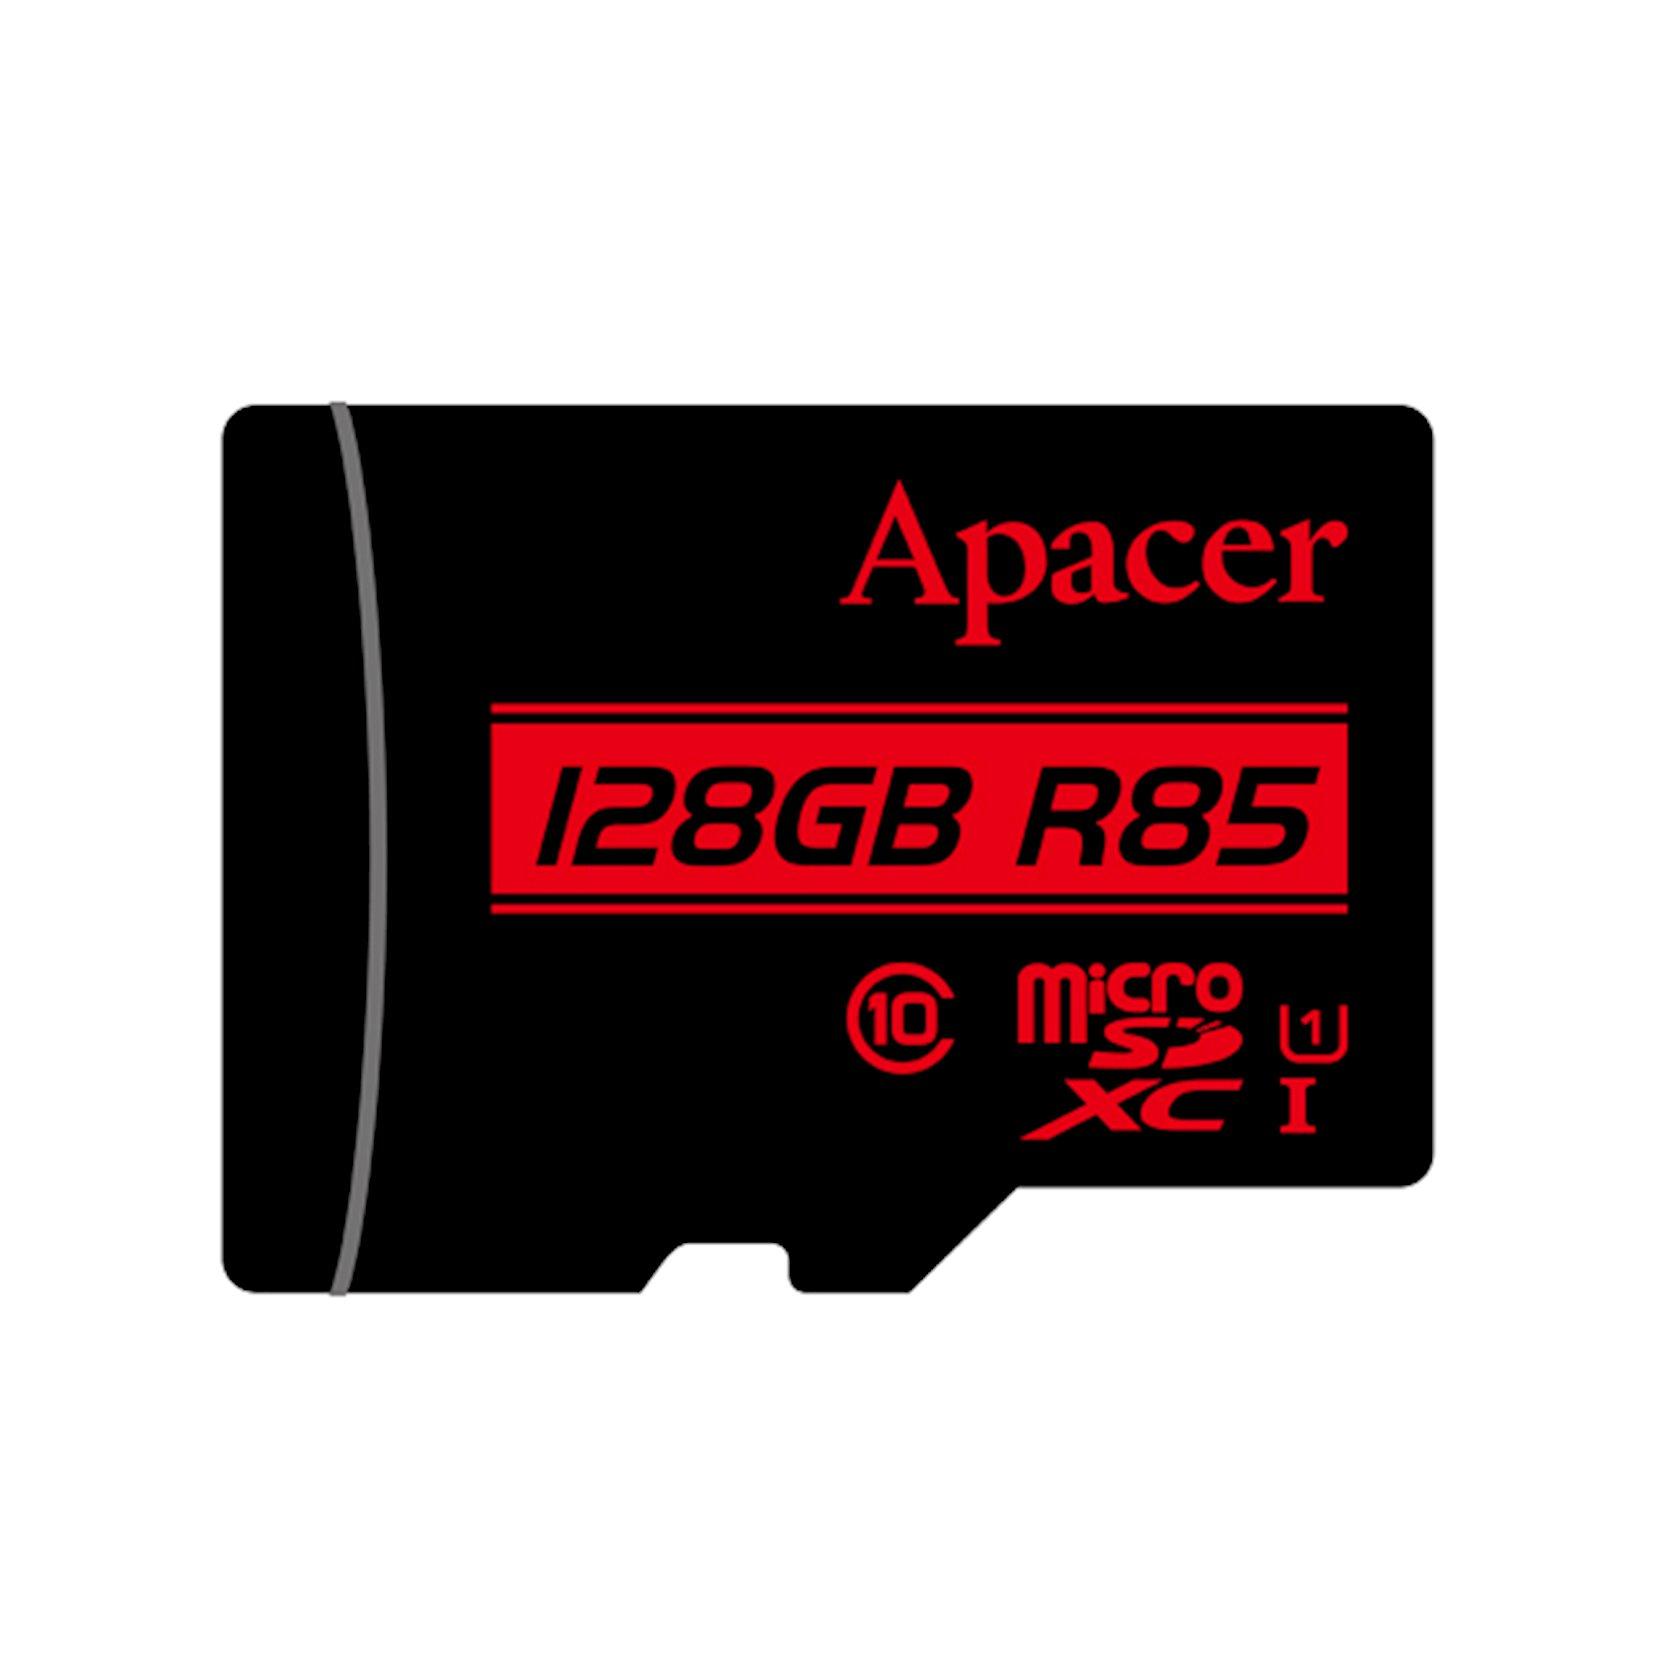 Yaddaş kartı Apacer 128 Gb microSdxc/Sdhc Uhs-I U1 Class 10 (R85 Mb/s) + SD adapter